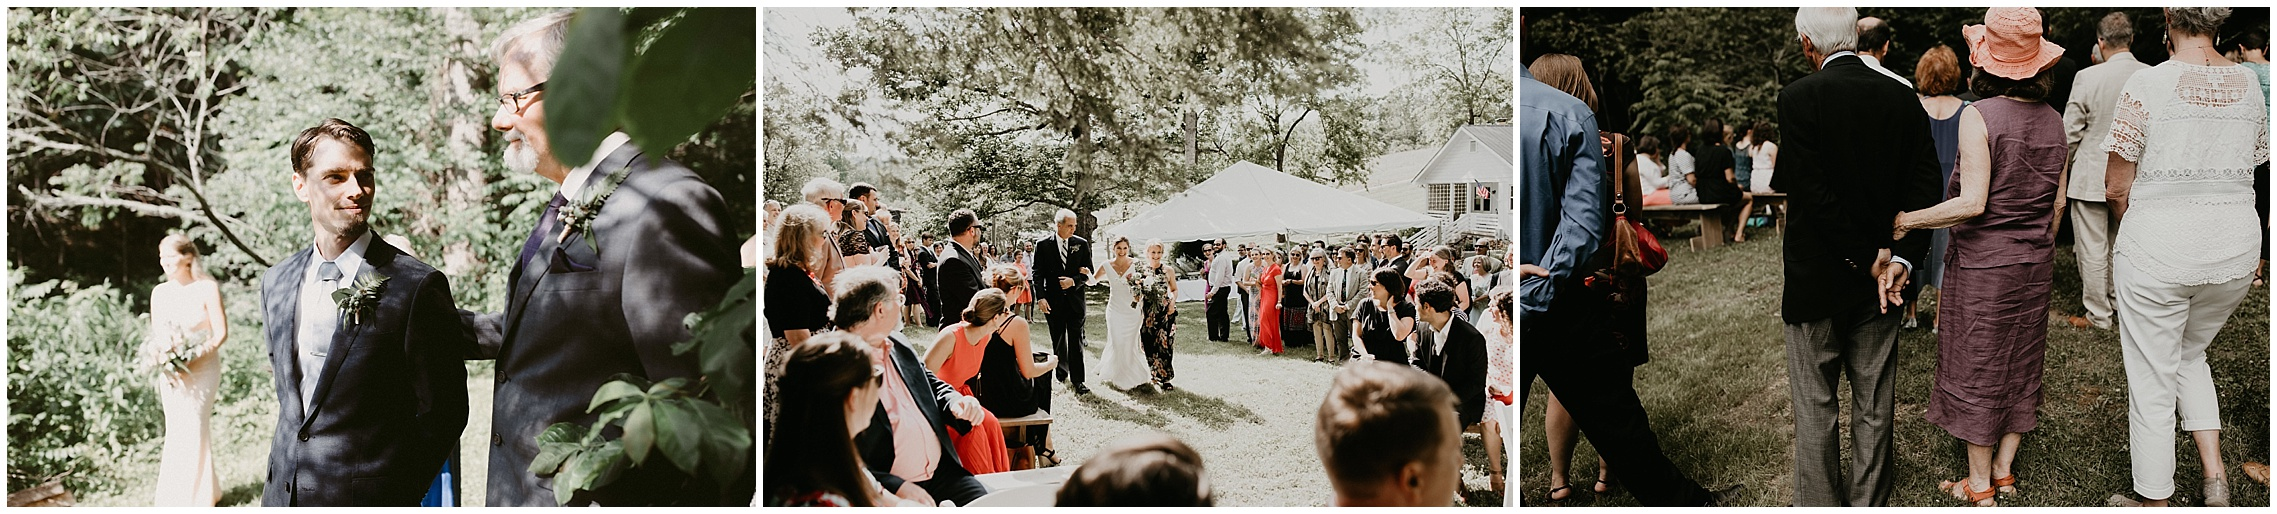 rock_creek_gardens_washington_wedding_photographer_0332.jpg